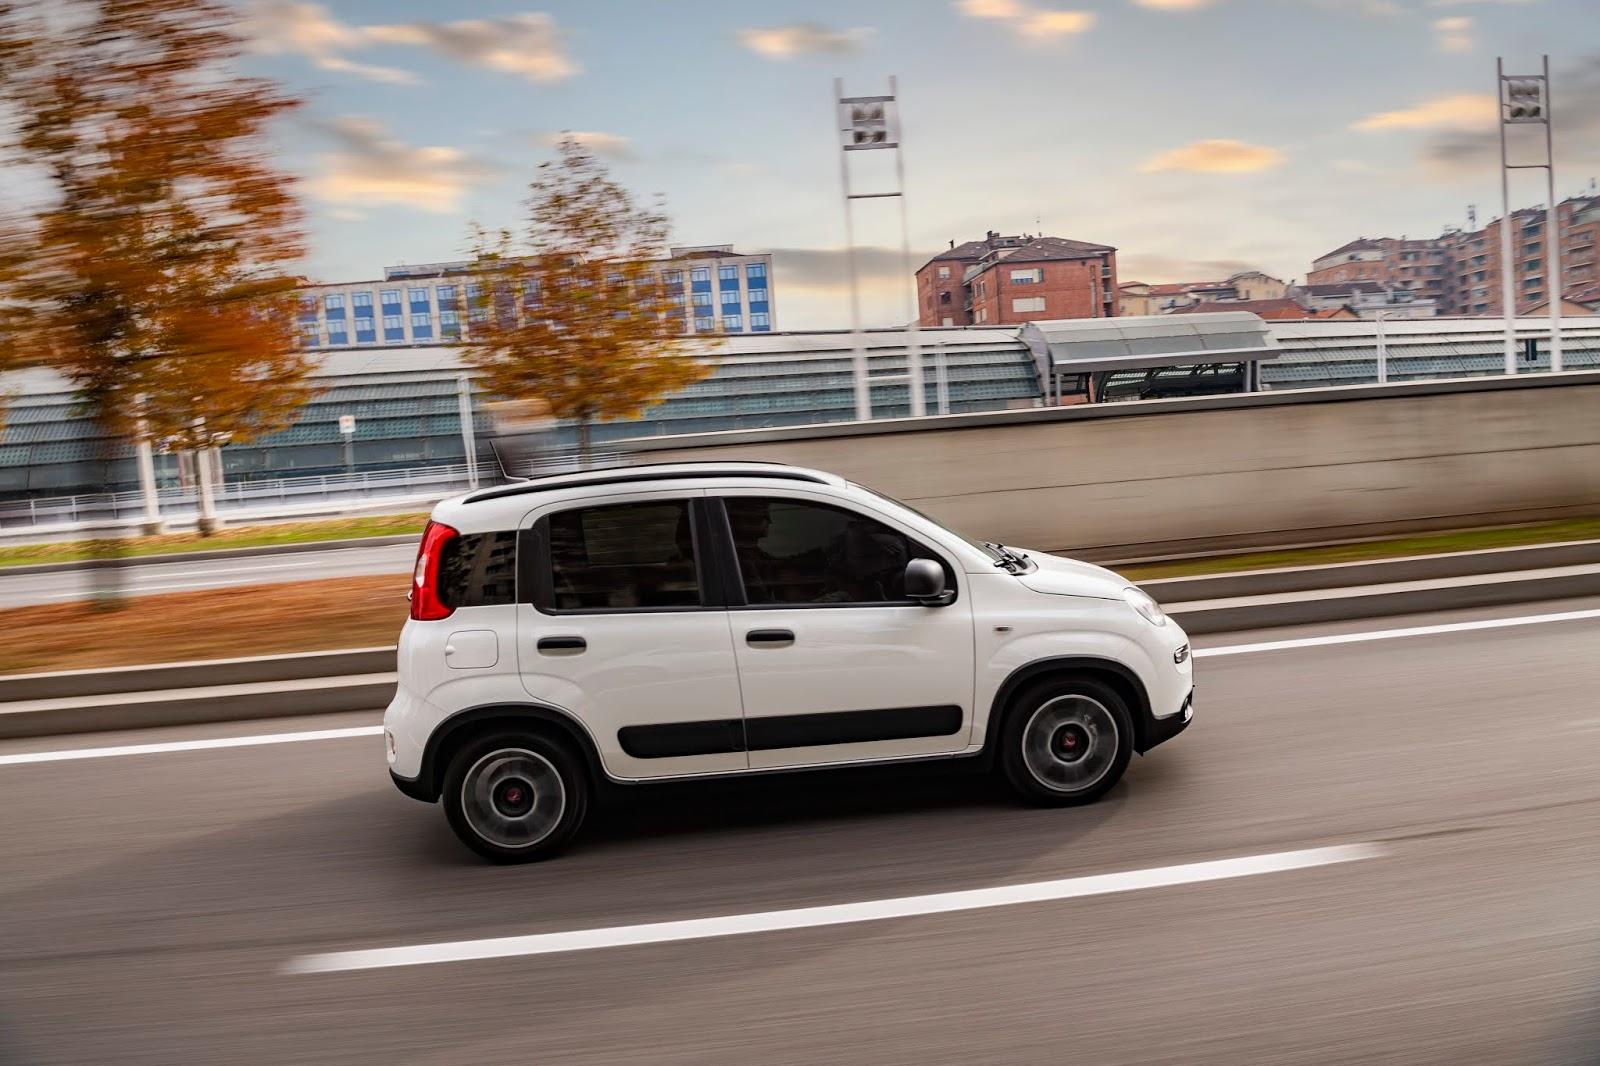 Panda2BCity2BLife2B252842529 Νέο Fiat Panda CNG : Οικονομία με στιλ και τεχνολογία CNG, Fiat, Fiat Panda, Panda, ειδήσεις